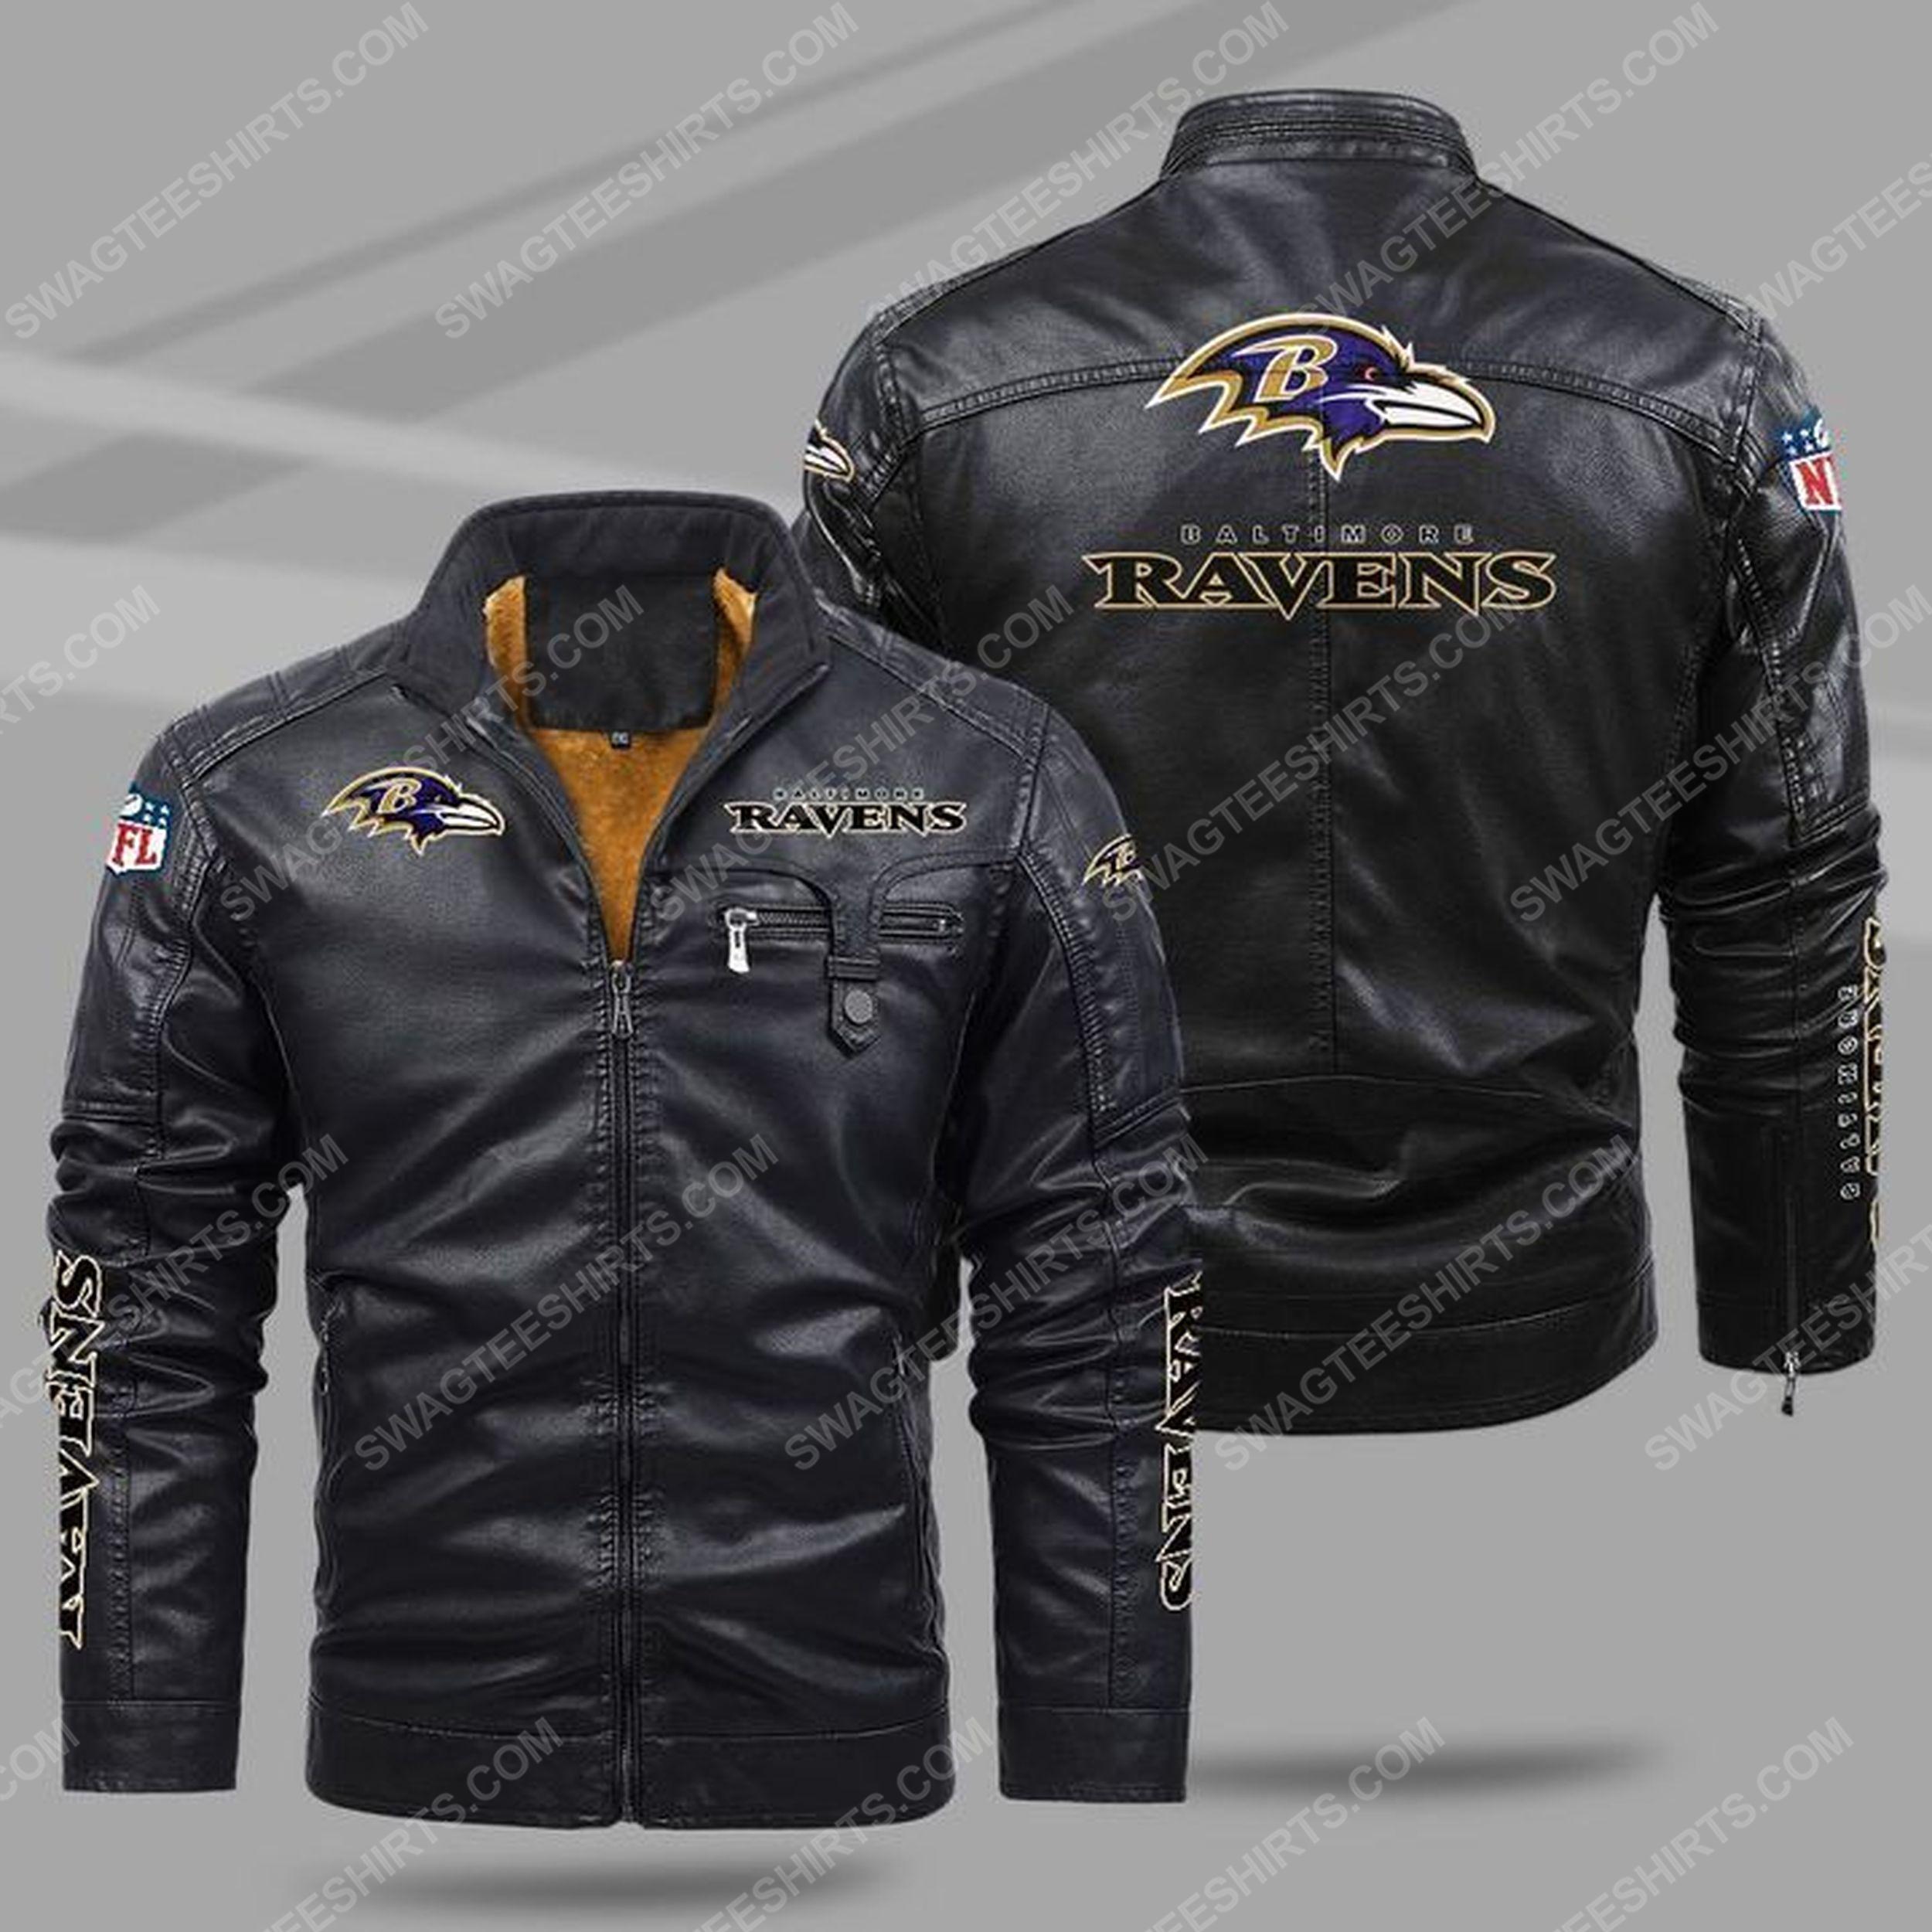 The baltimore ravens nfl all over print fleece leather jacket - black 1